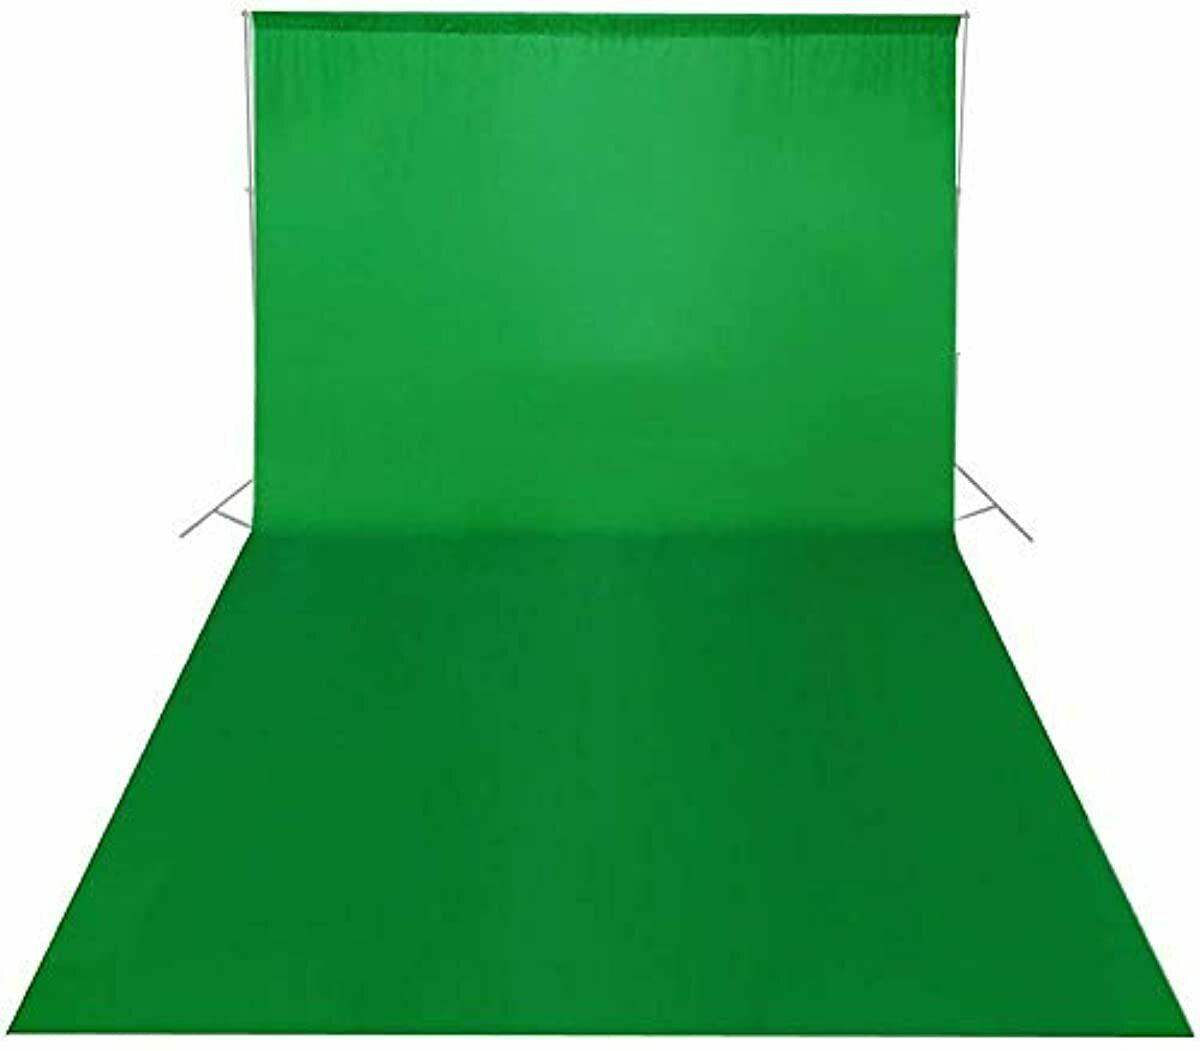 Chroma Key Background Backdrop Cloth For Studio 5.2ftx10ft 1.6x3M Green Screen - $14.00